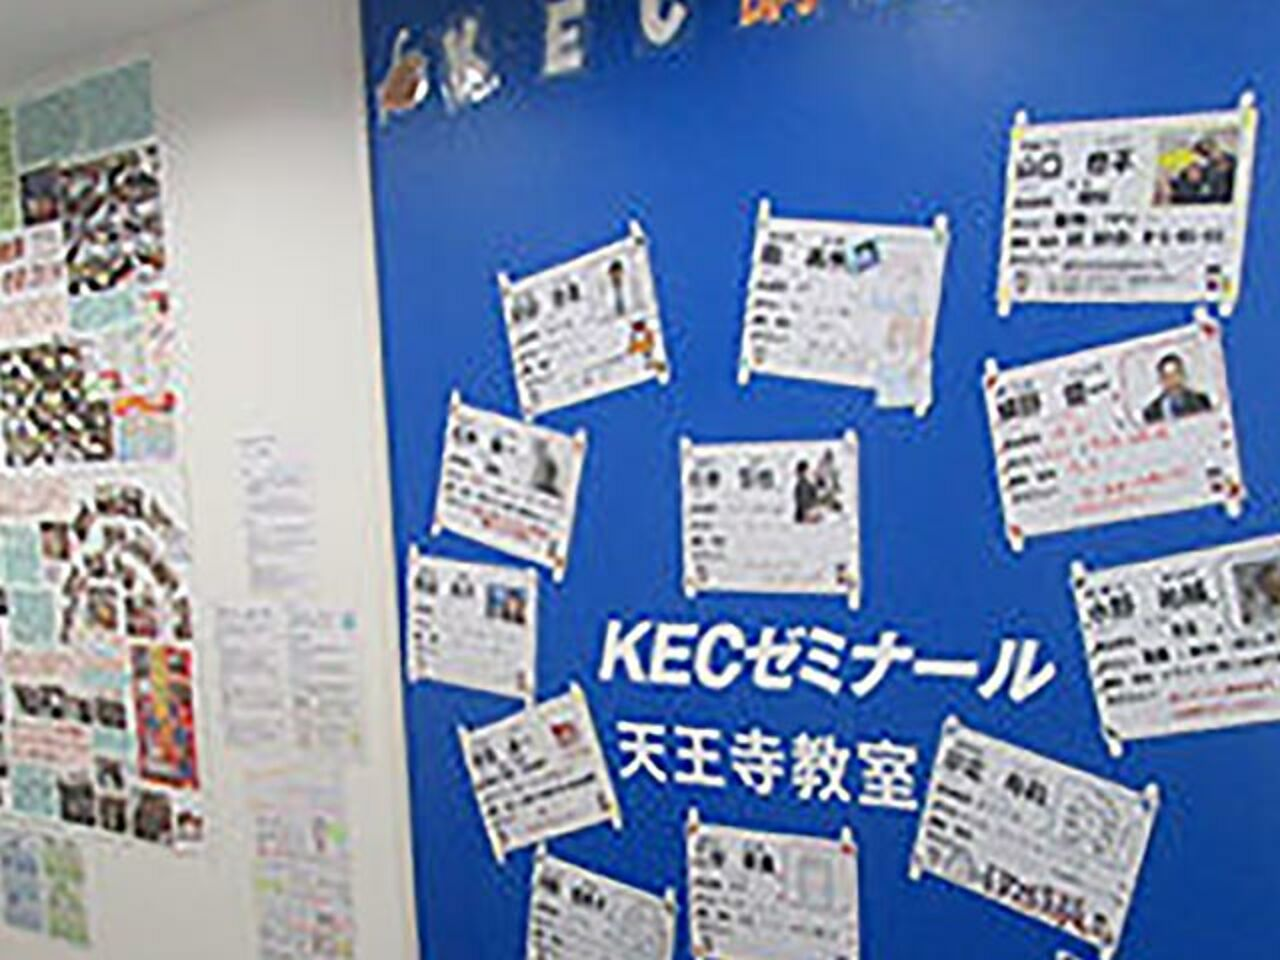 KECゼミナール・KEC志学館ゼミナール天王寺教室の画像